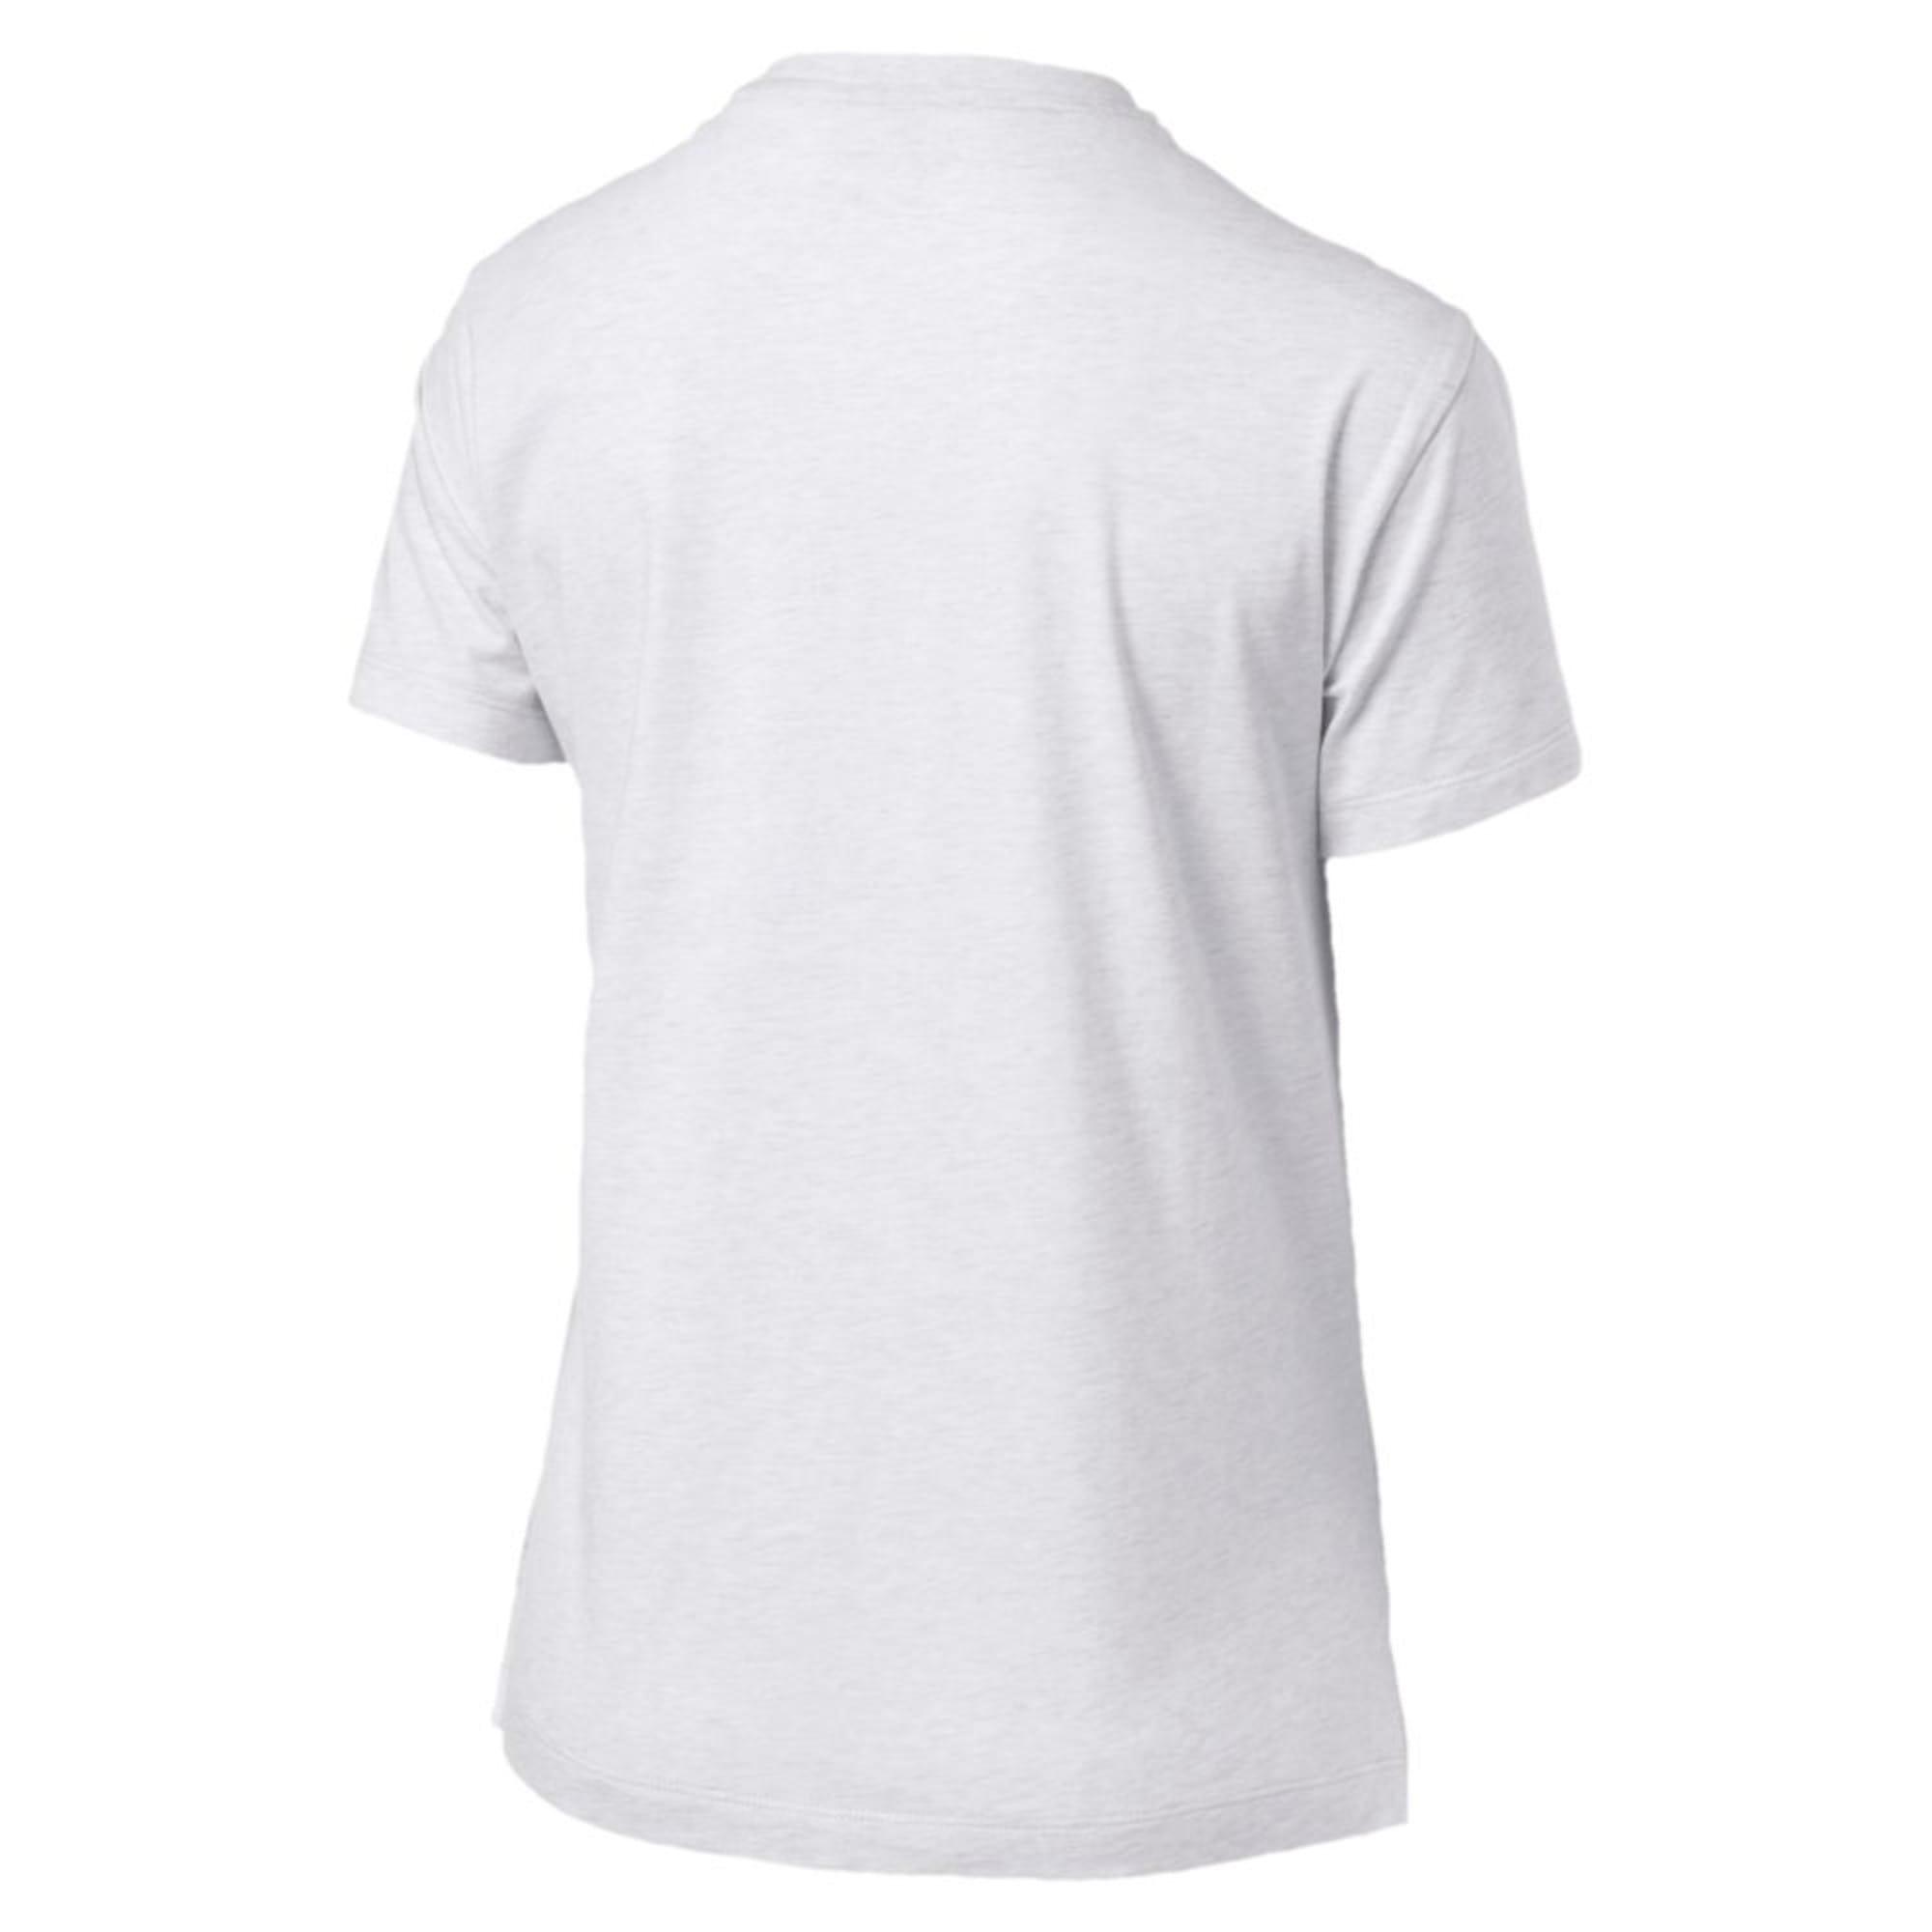 Thumbnail 2 of Classics Logo Women's T-Shirt, Puma White Heather-B1004, medium-IND